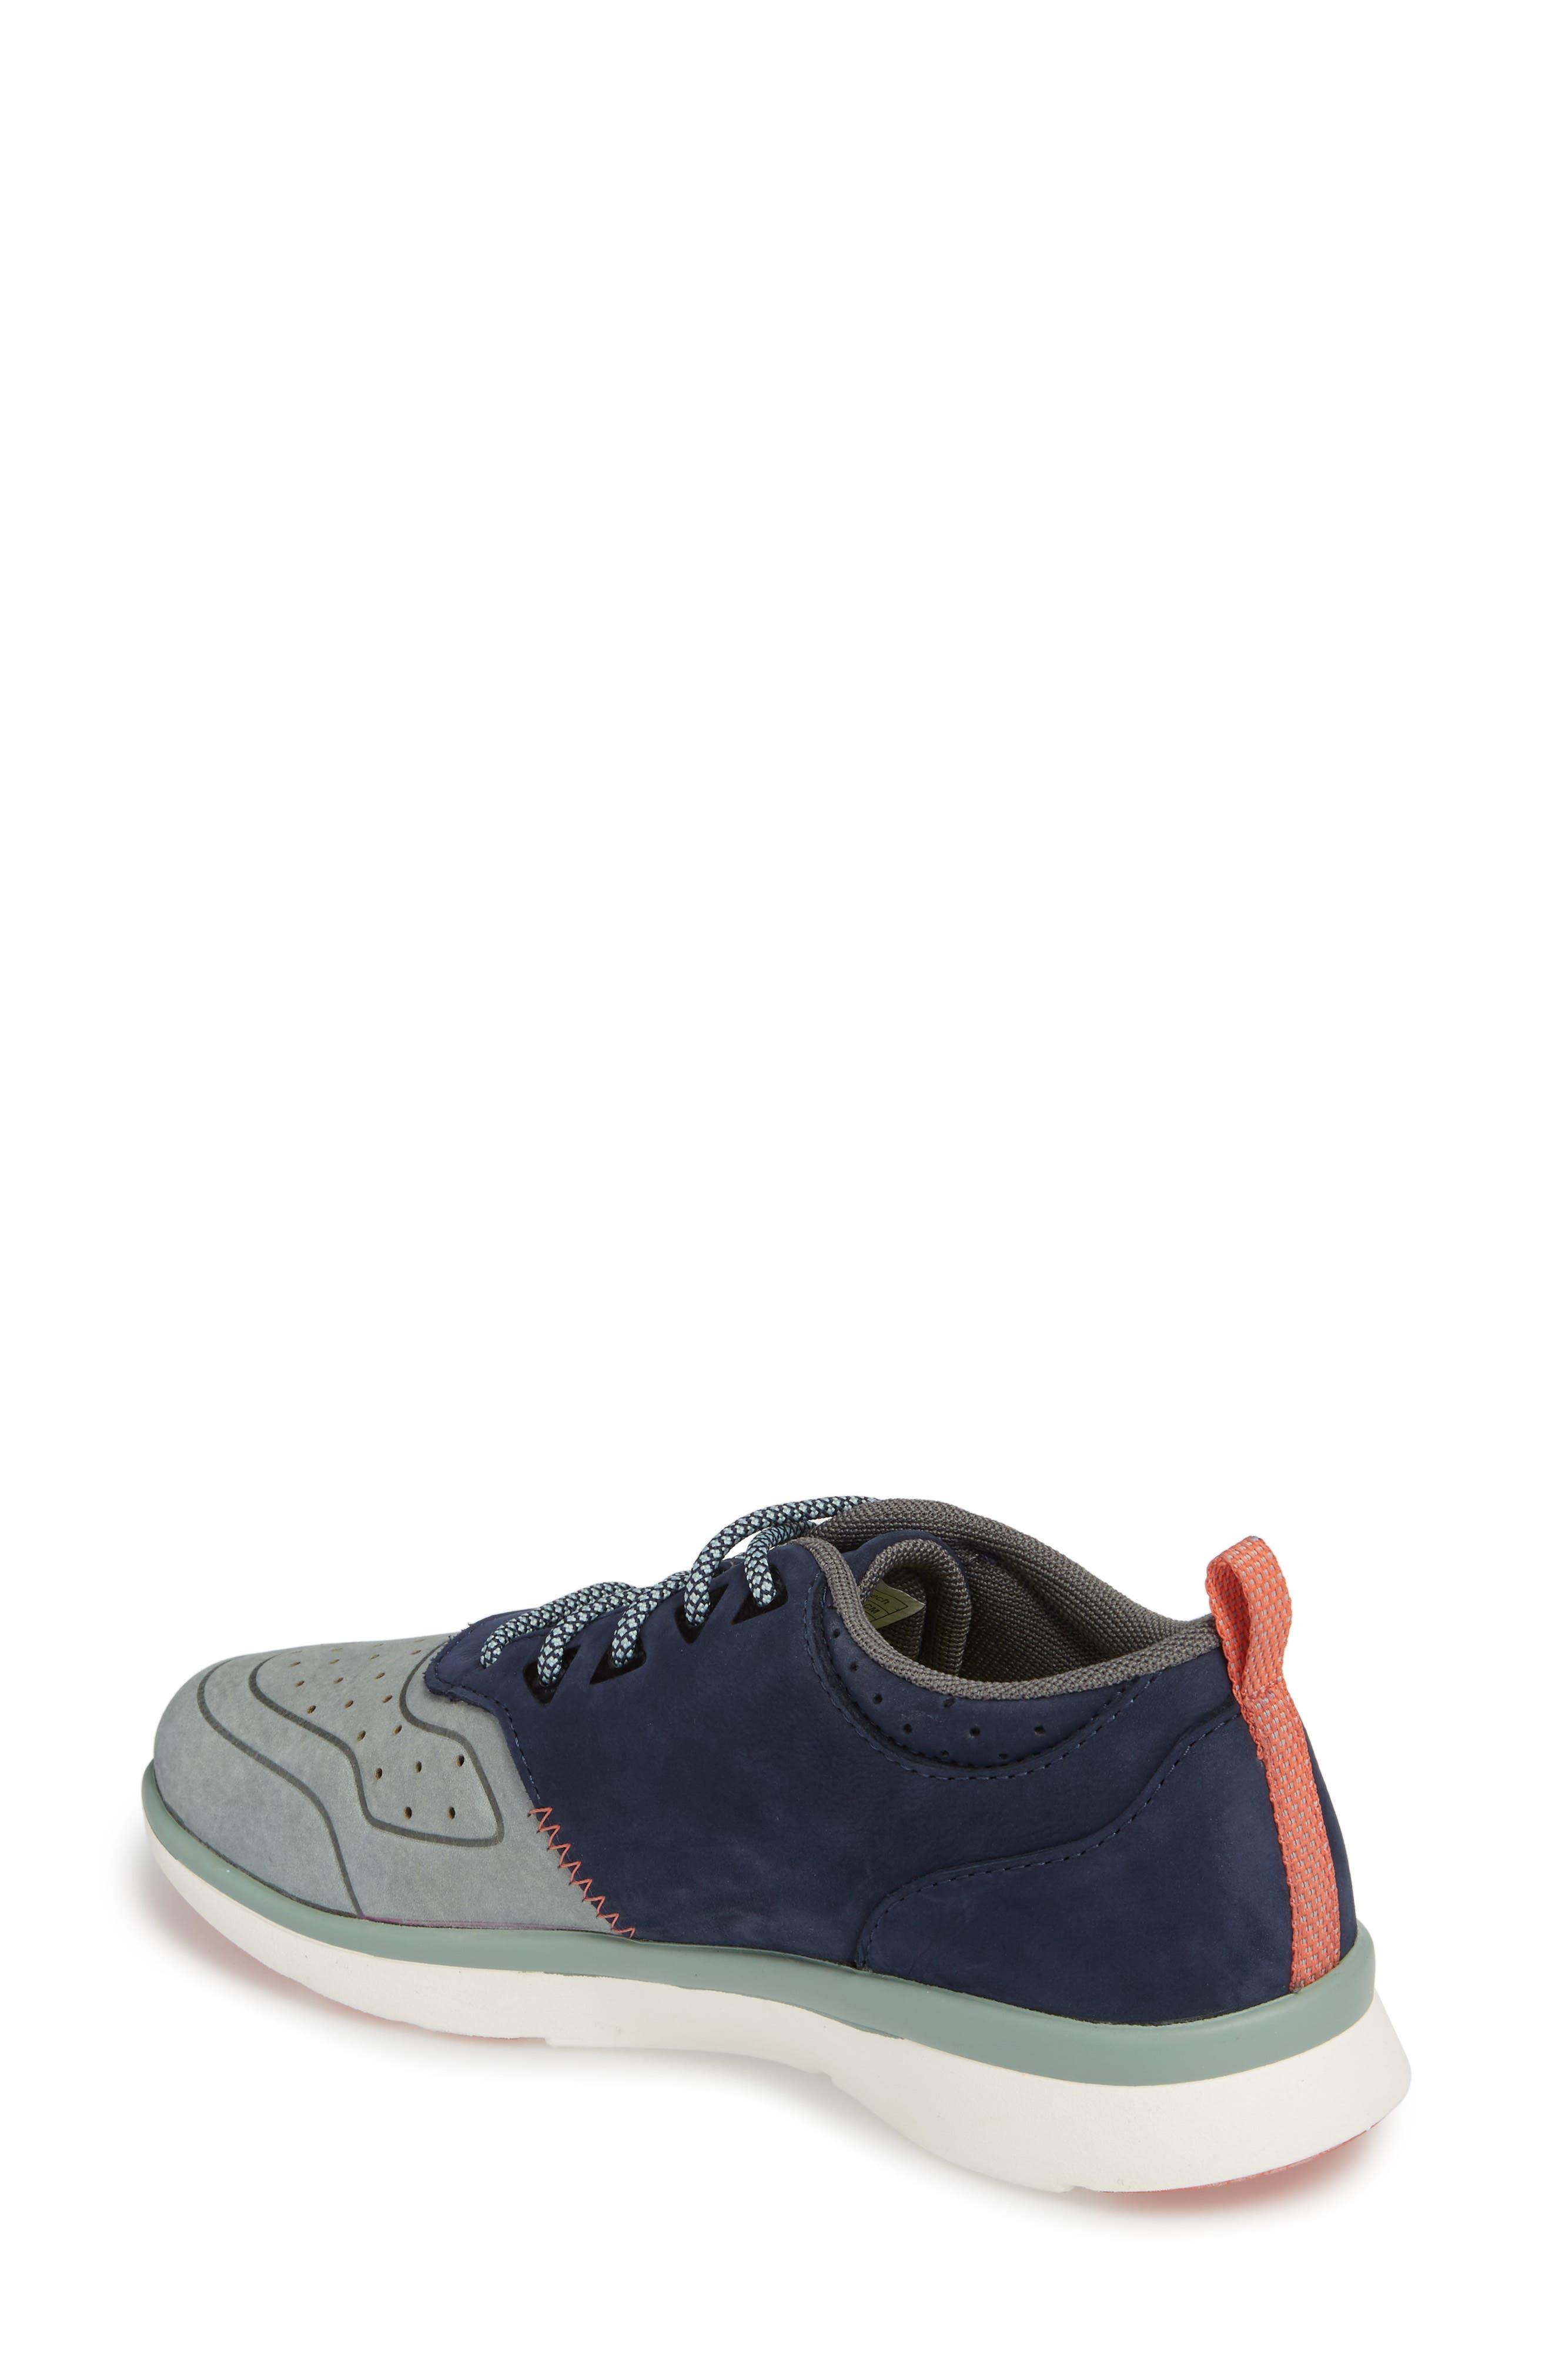 Beech Sneaker,                             Alternate thumbnail 2, color,                             Blue Leather